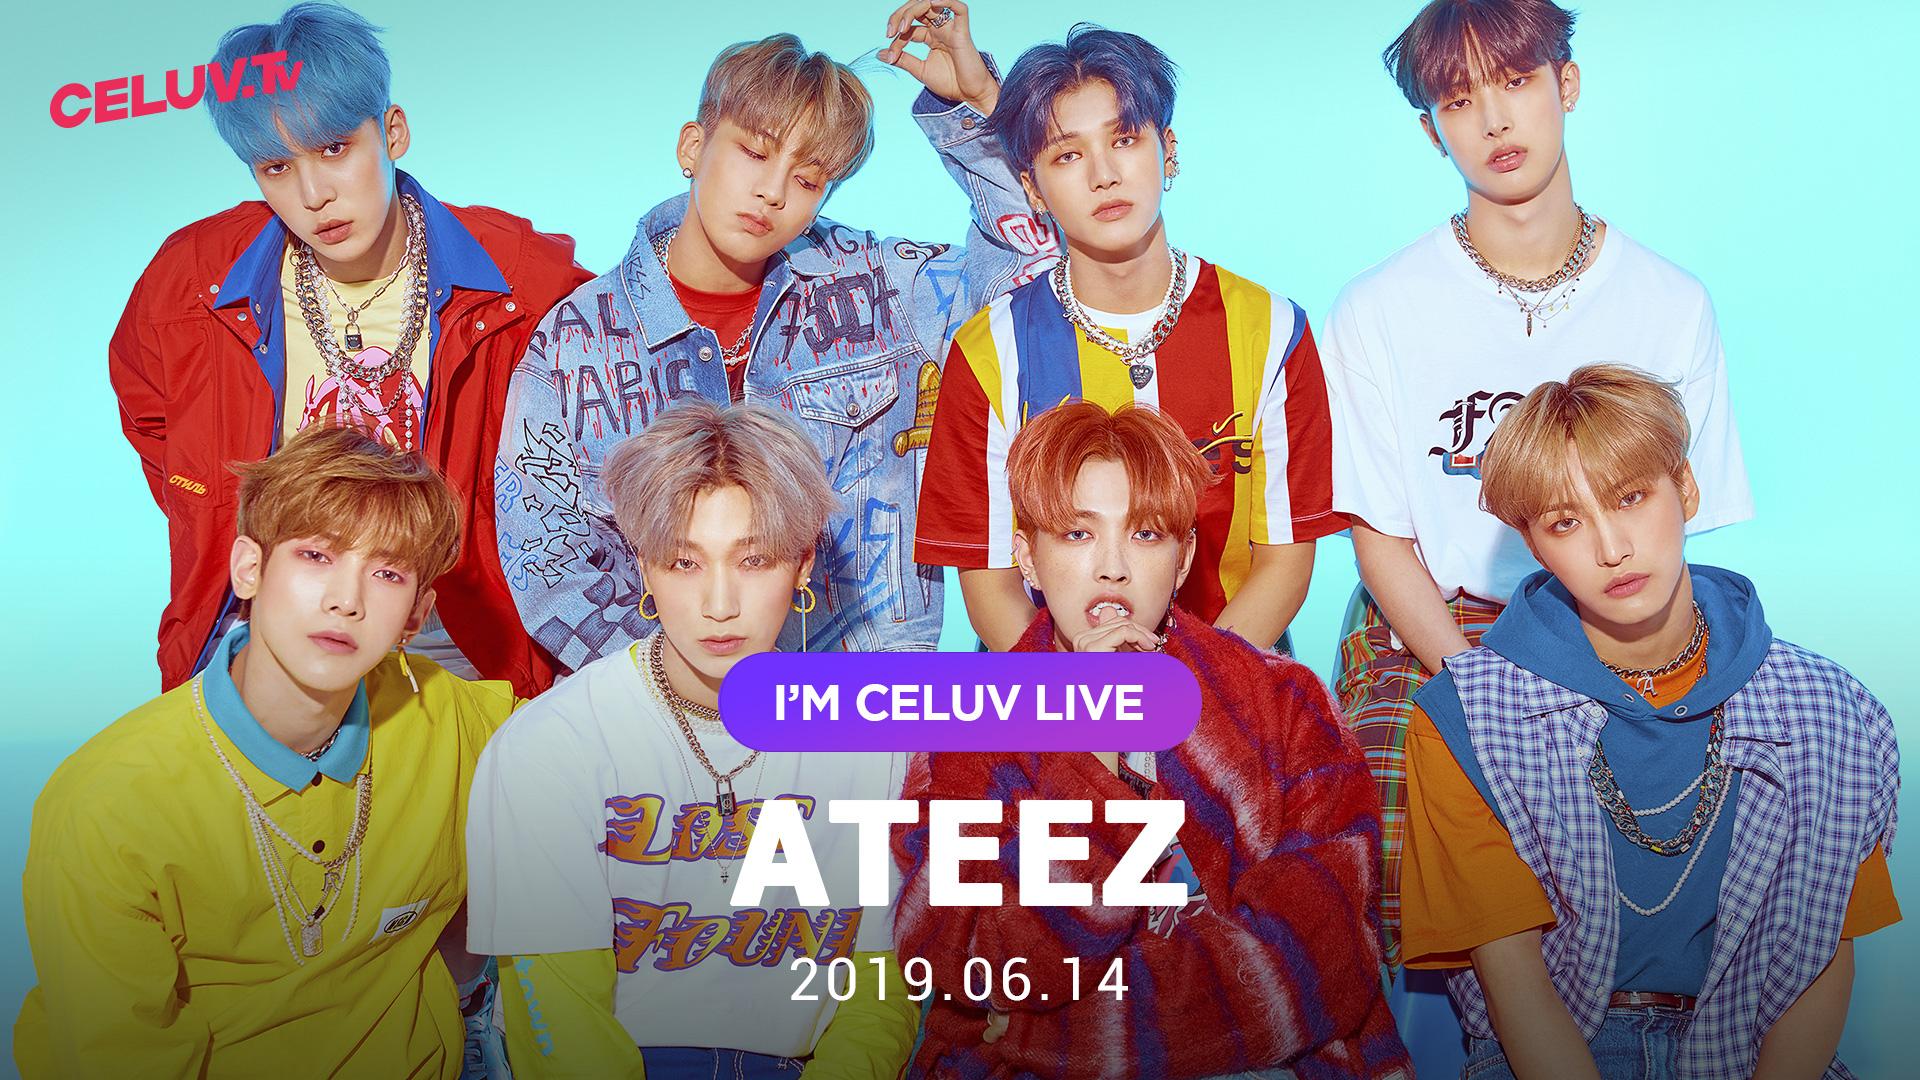 [Replay][I'm Celuv] 에이티즈(ATEEZ), 차세대 글로벌 퍼포먼스돌 (Celuv.TV)